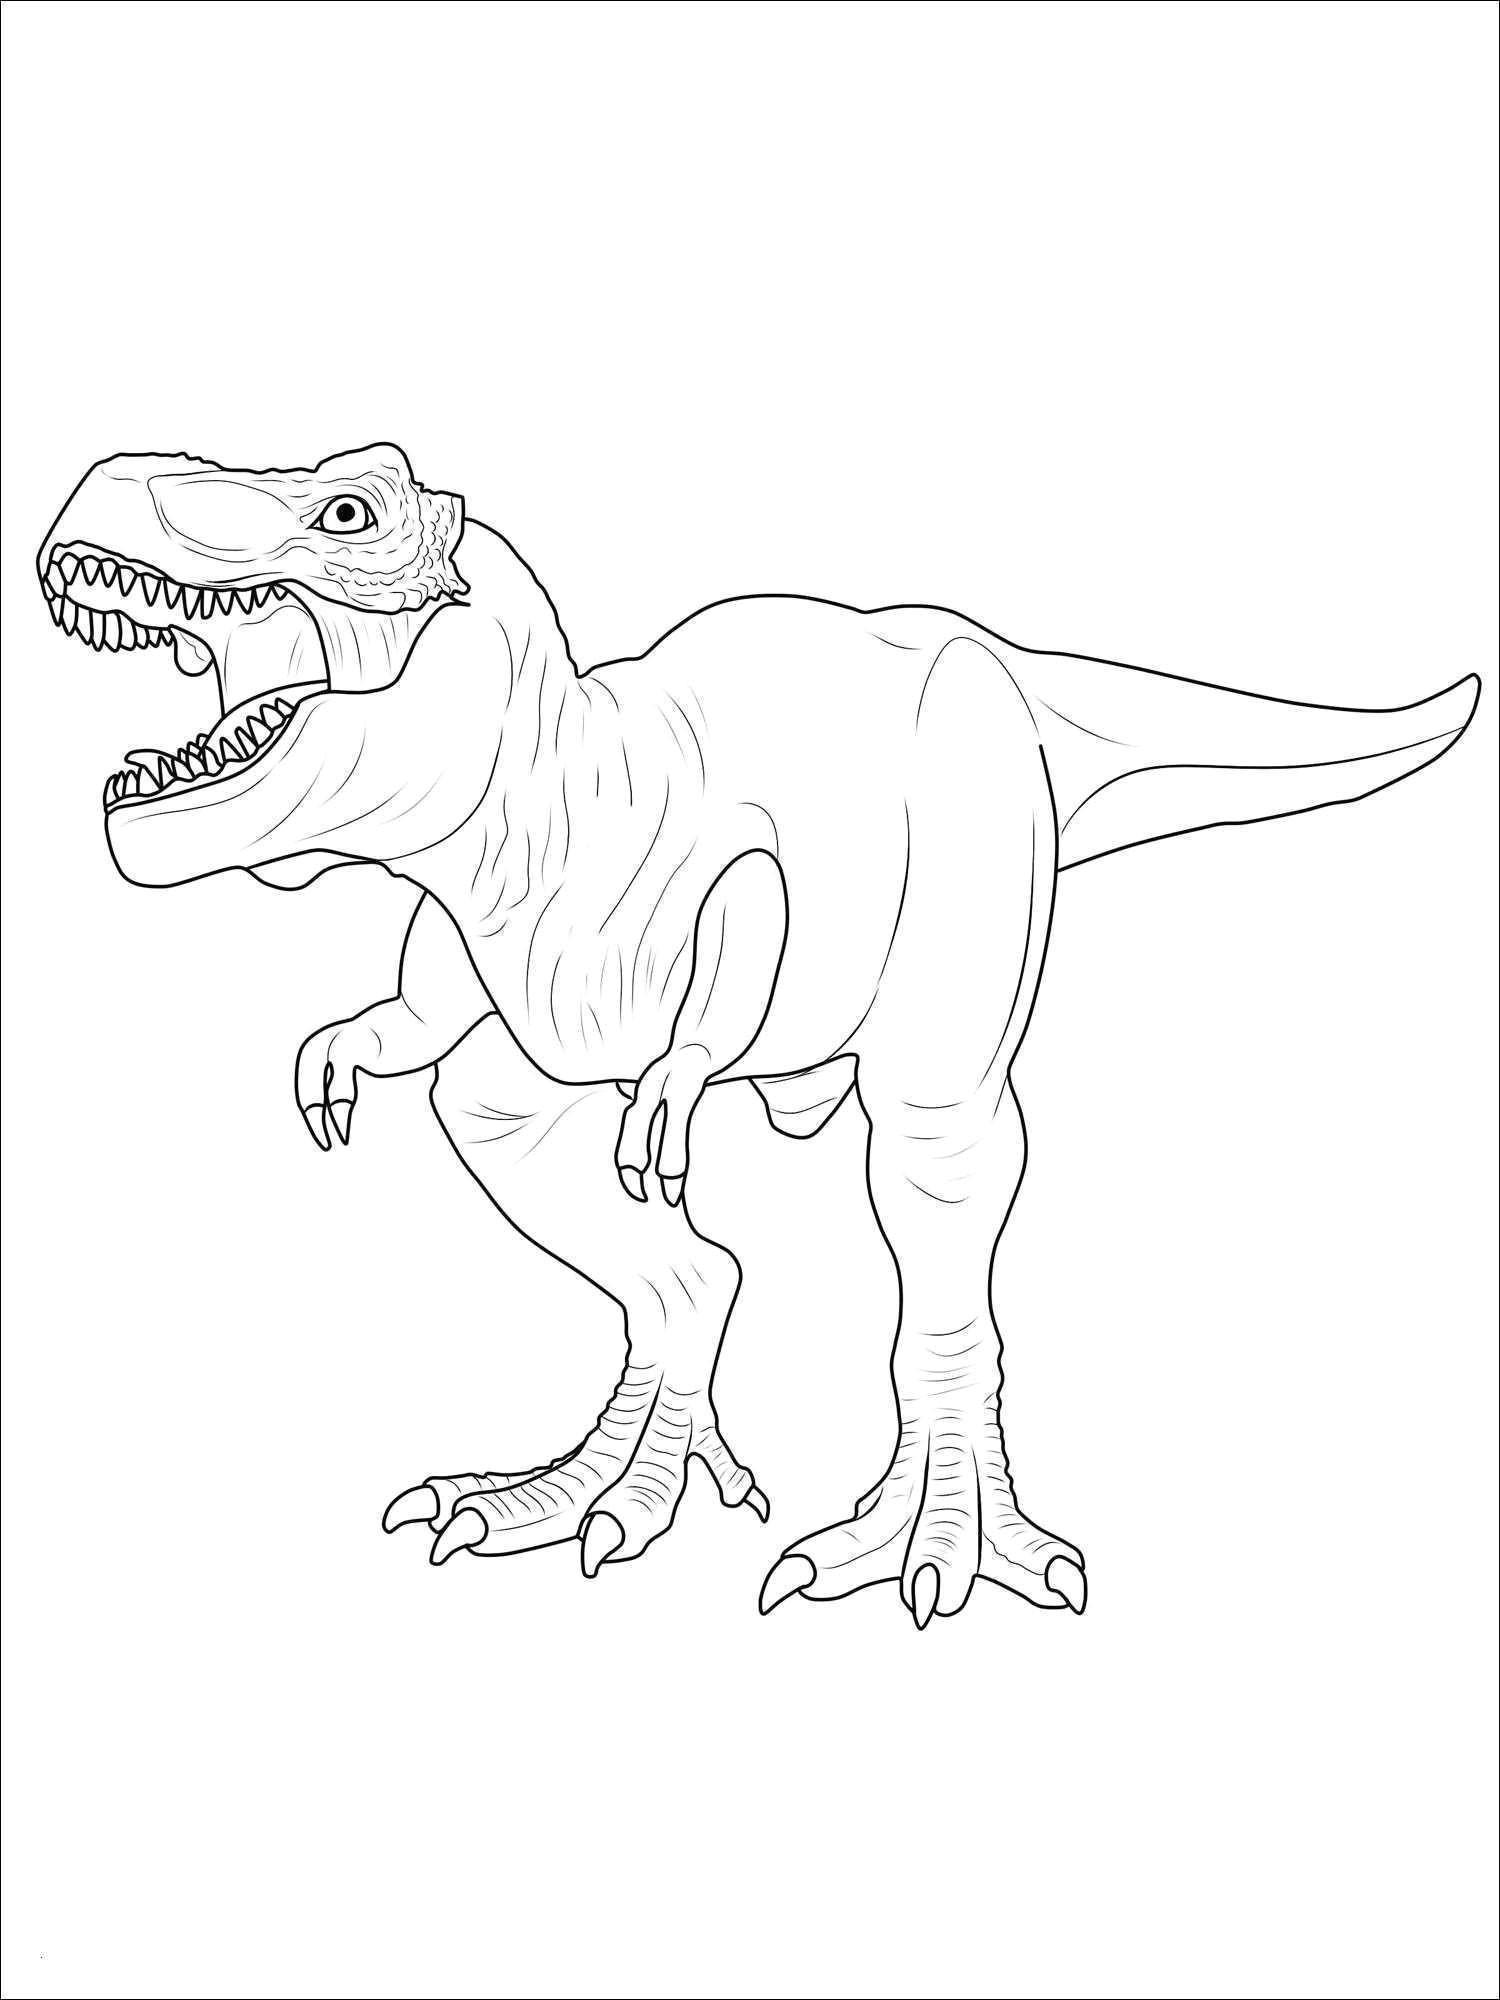 0d archives uploadertalk tyrannosaurus rex ausmalbild nouveau images t rex ausmalbilder bild tyrannosaurus rex ausmalbilder best unique